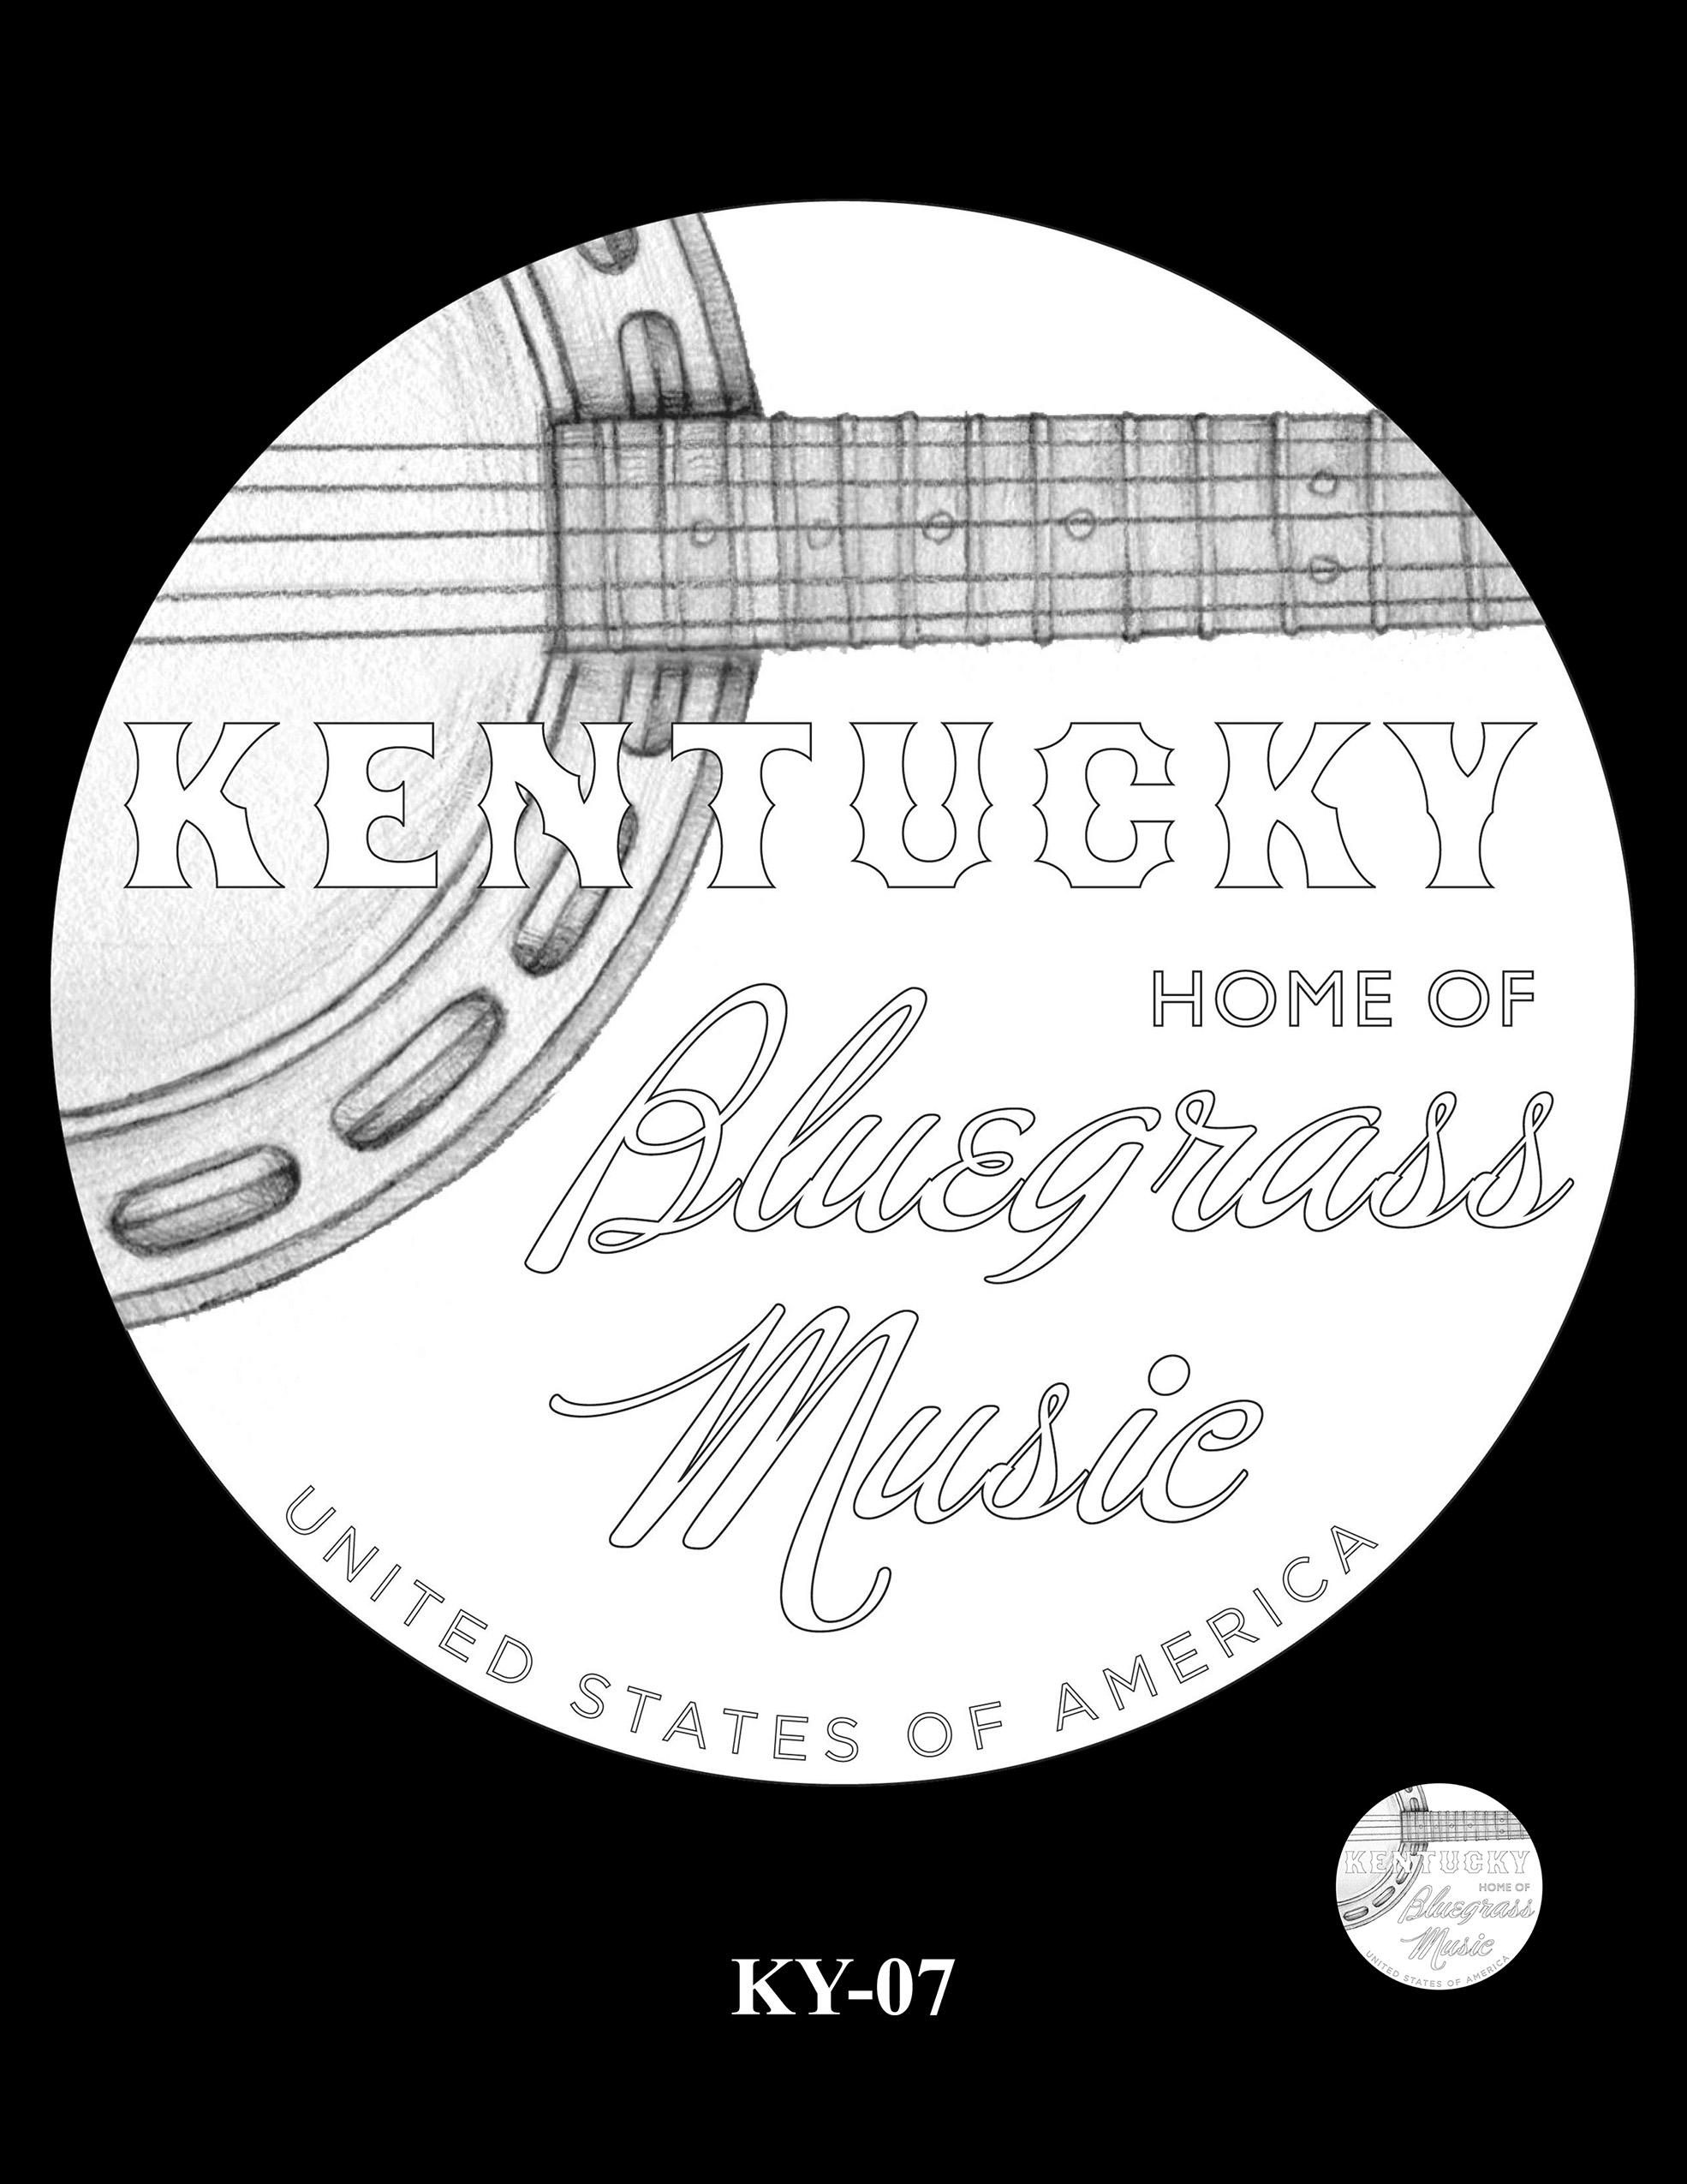 KY-07 -- 2022 American Innovation $1 Coin - Kentucky